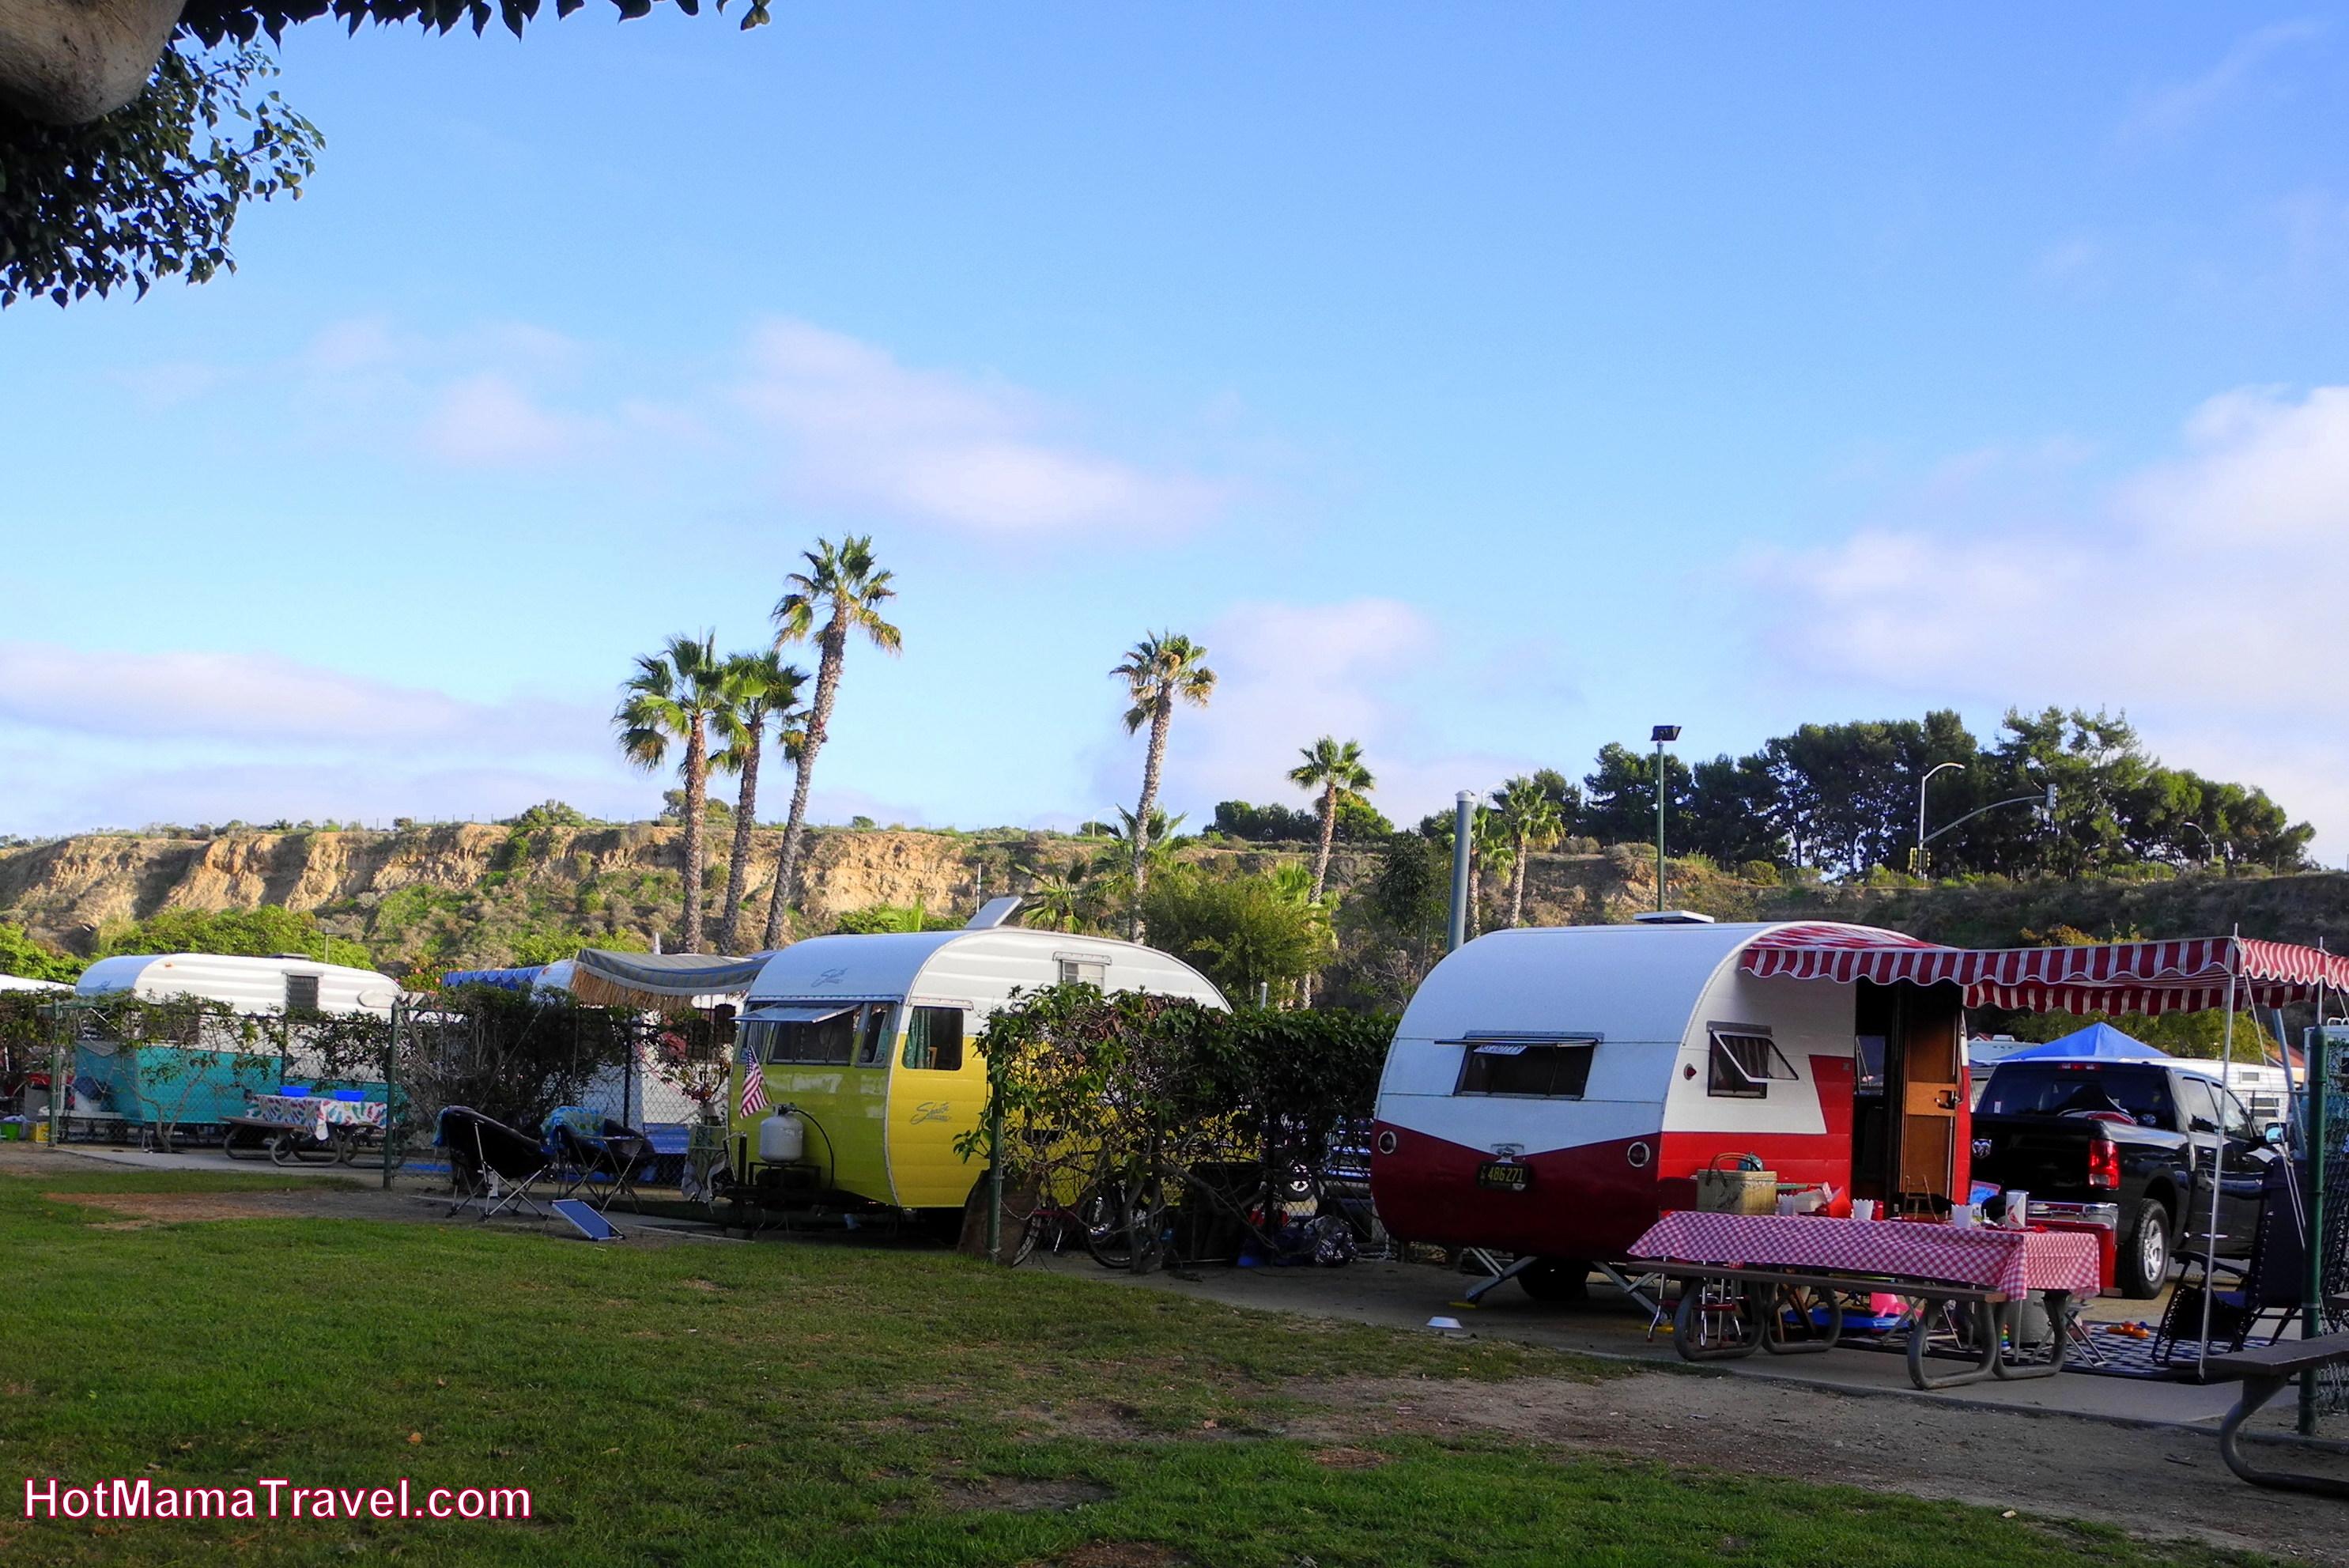 Newport Dunes Rv Park >> Hot RVing at the Newport Dunes Resort - HotMamaTravel